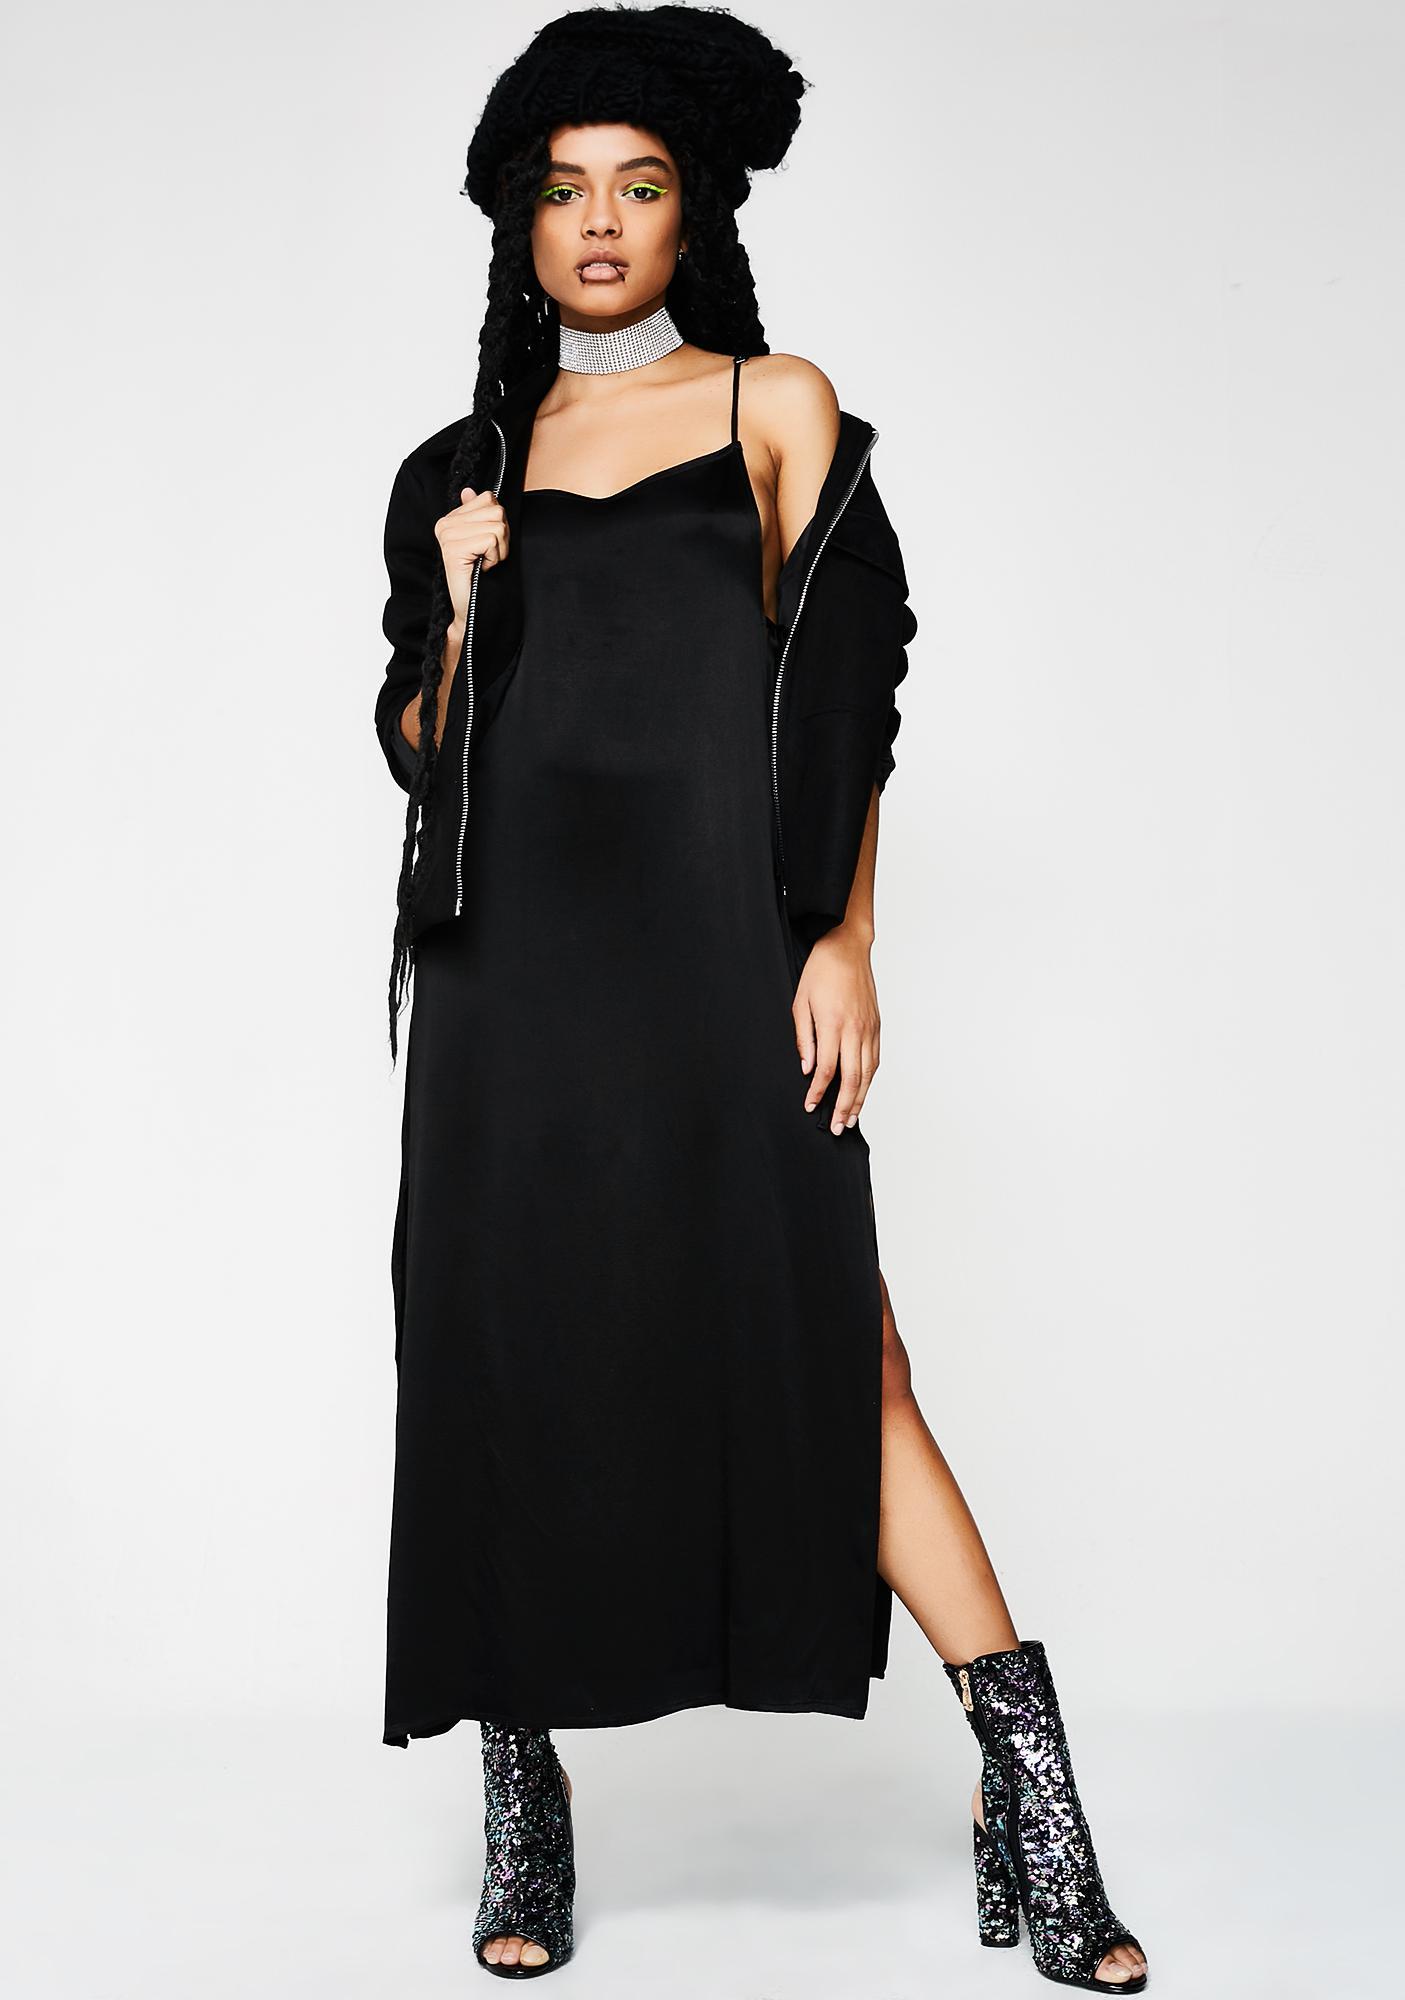 Twiin Slither Slip Dress